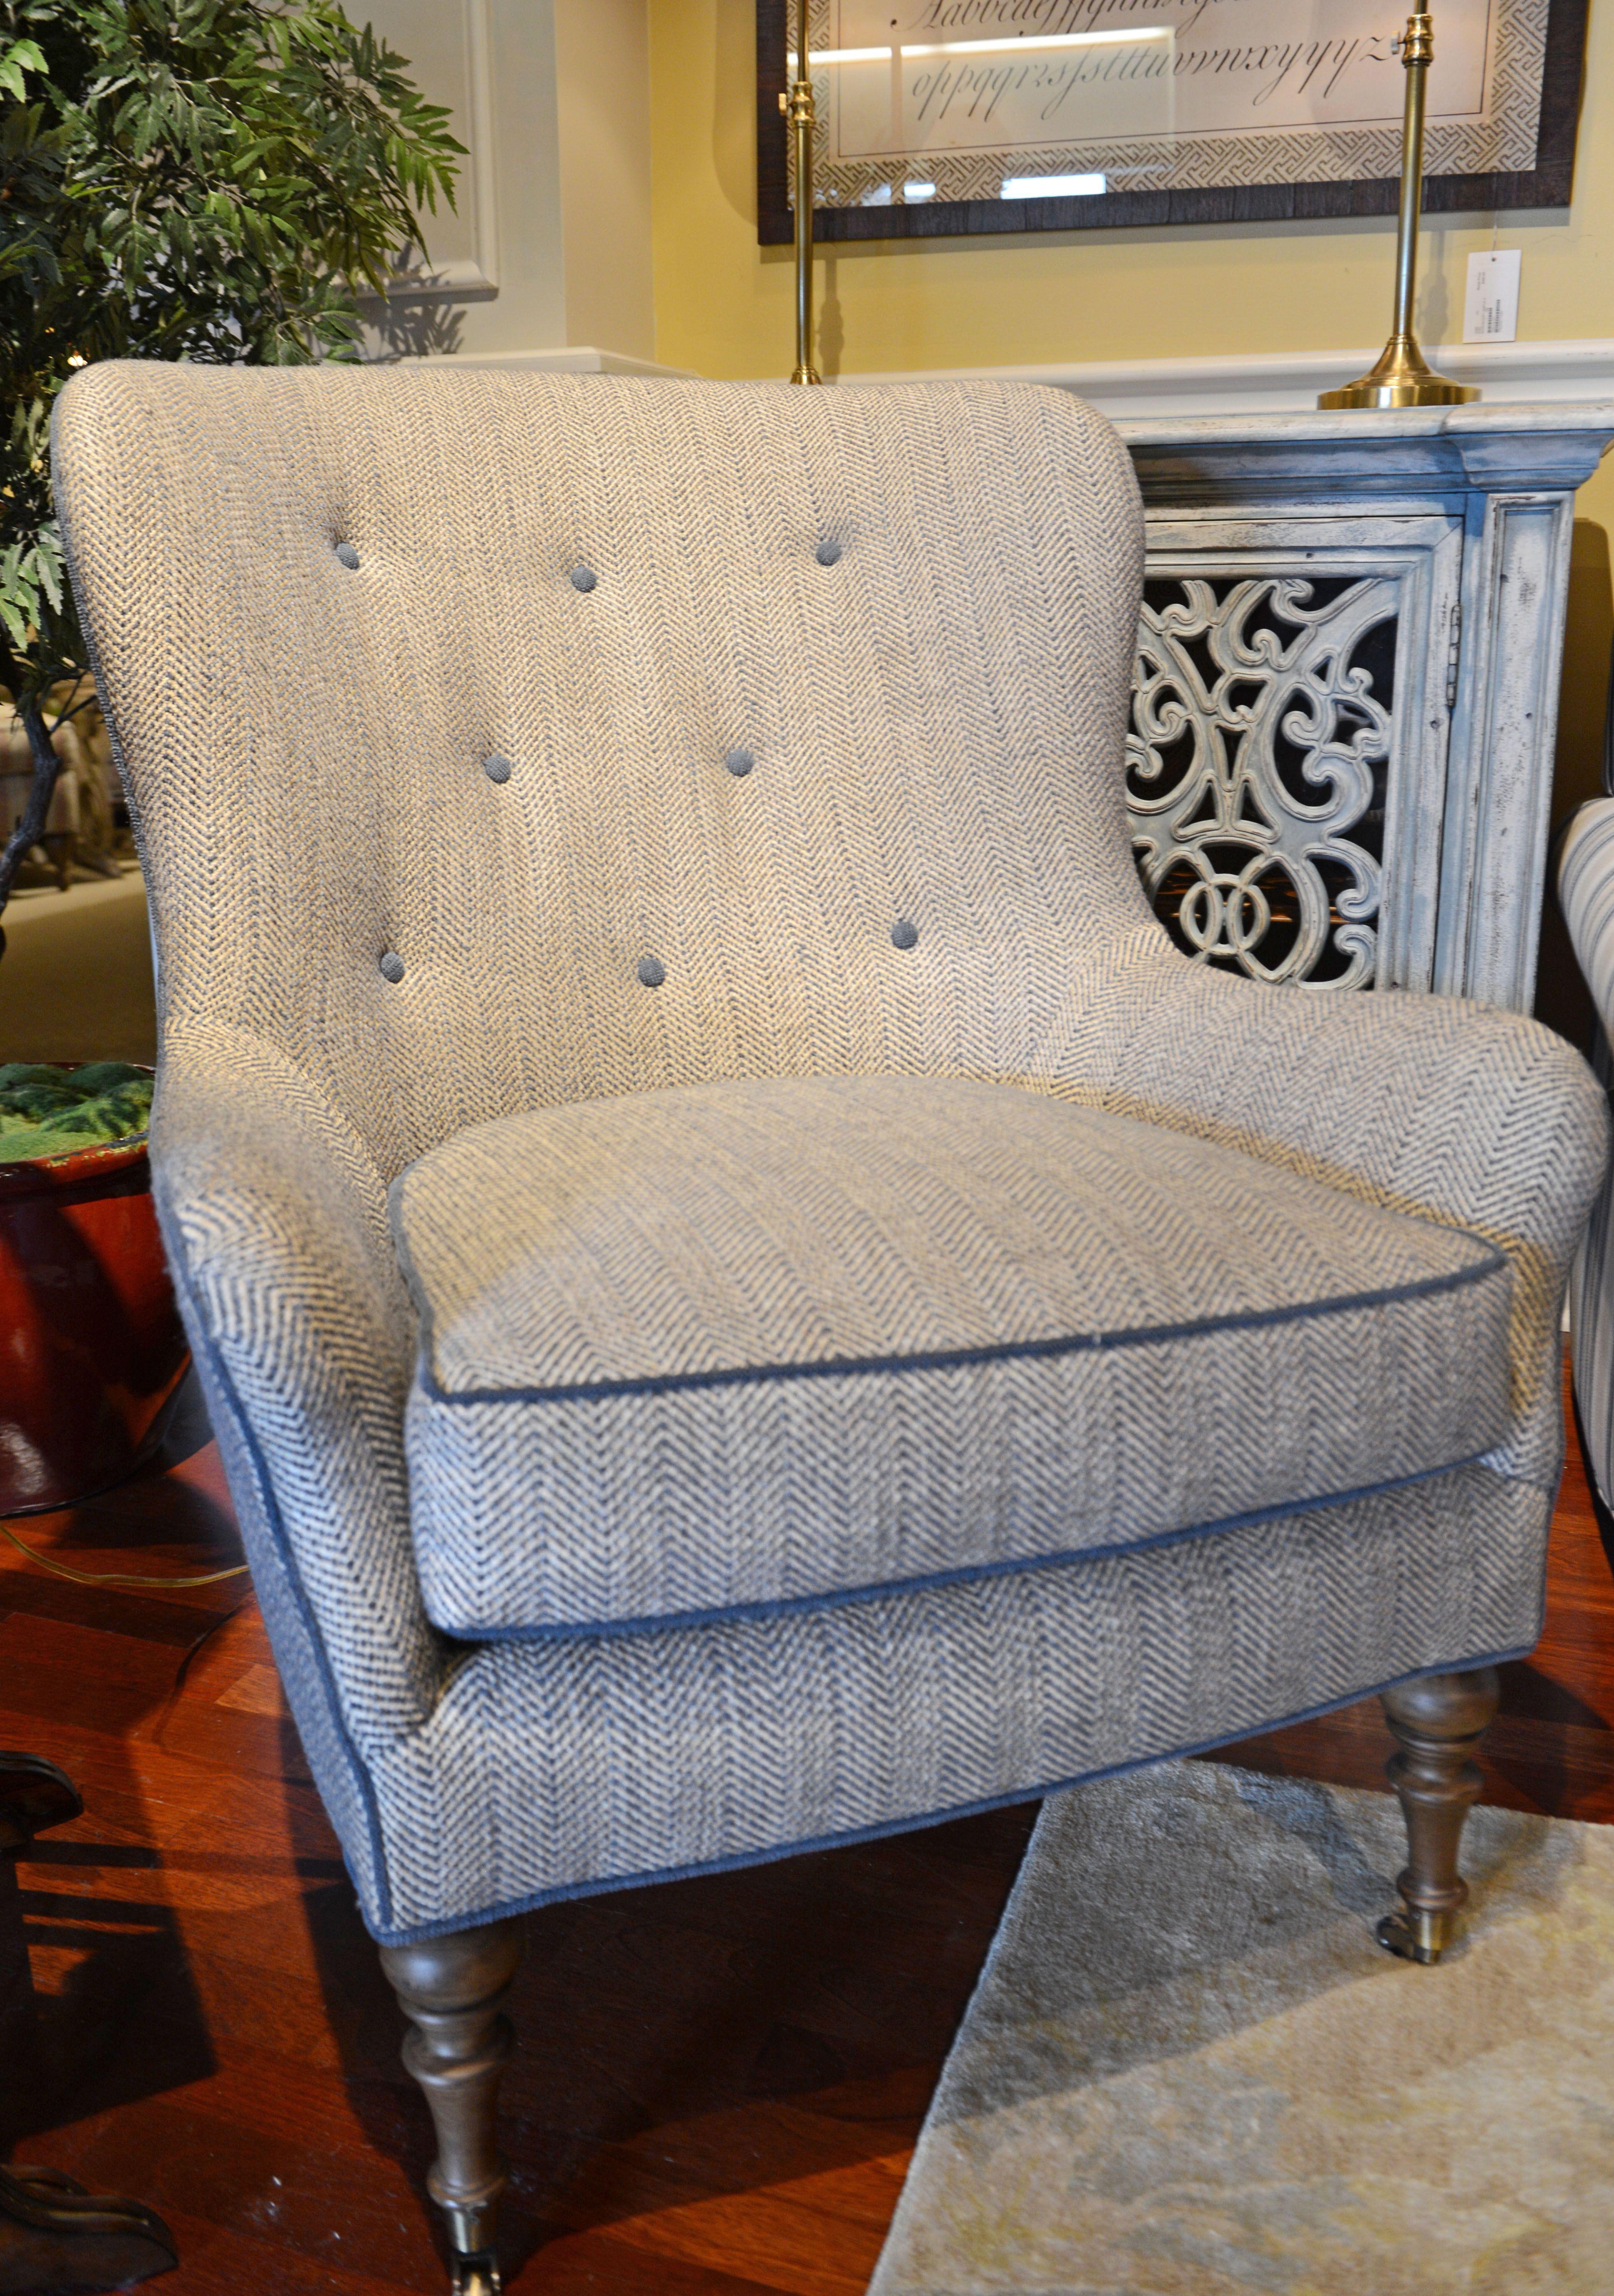 Menswear patterns like herringbone and houndstooth as upholstery